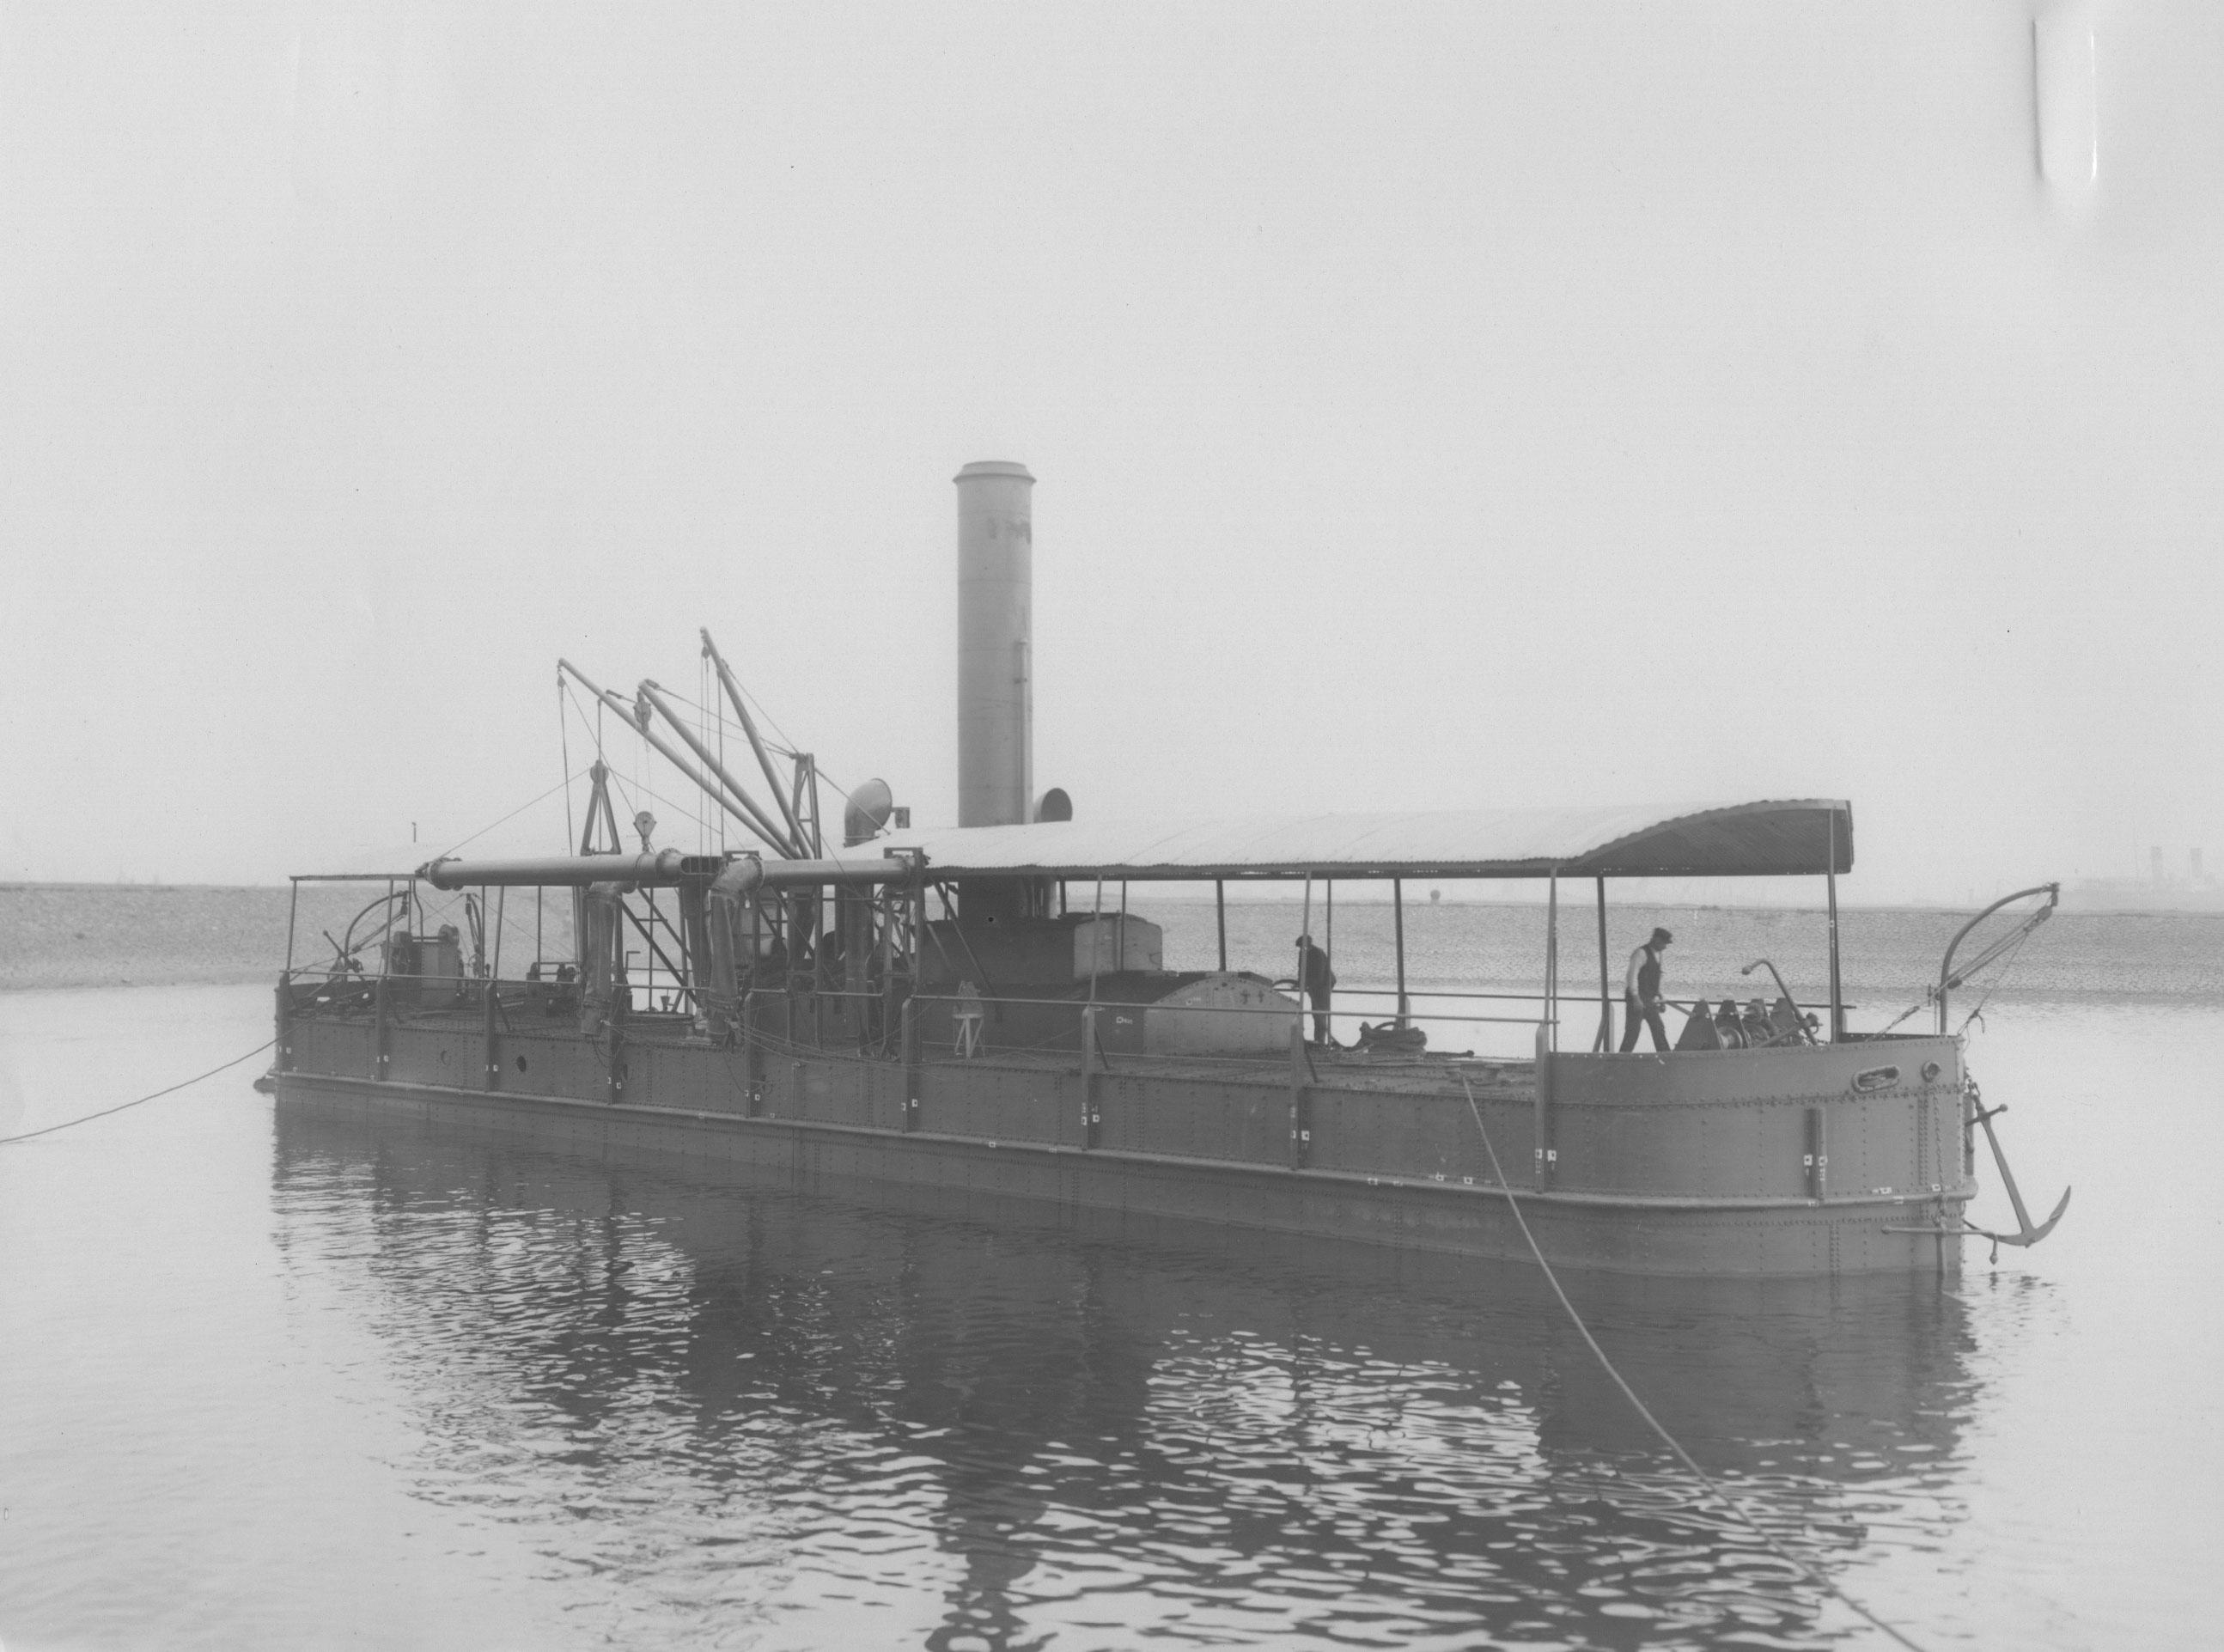 Bnr. 432: Profiel & Bakkenzuiger (1912)